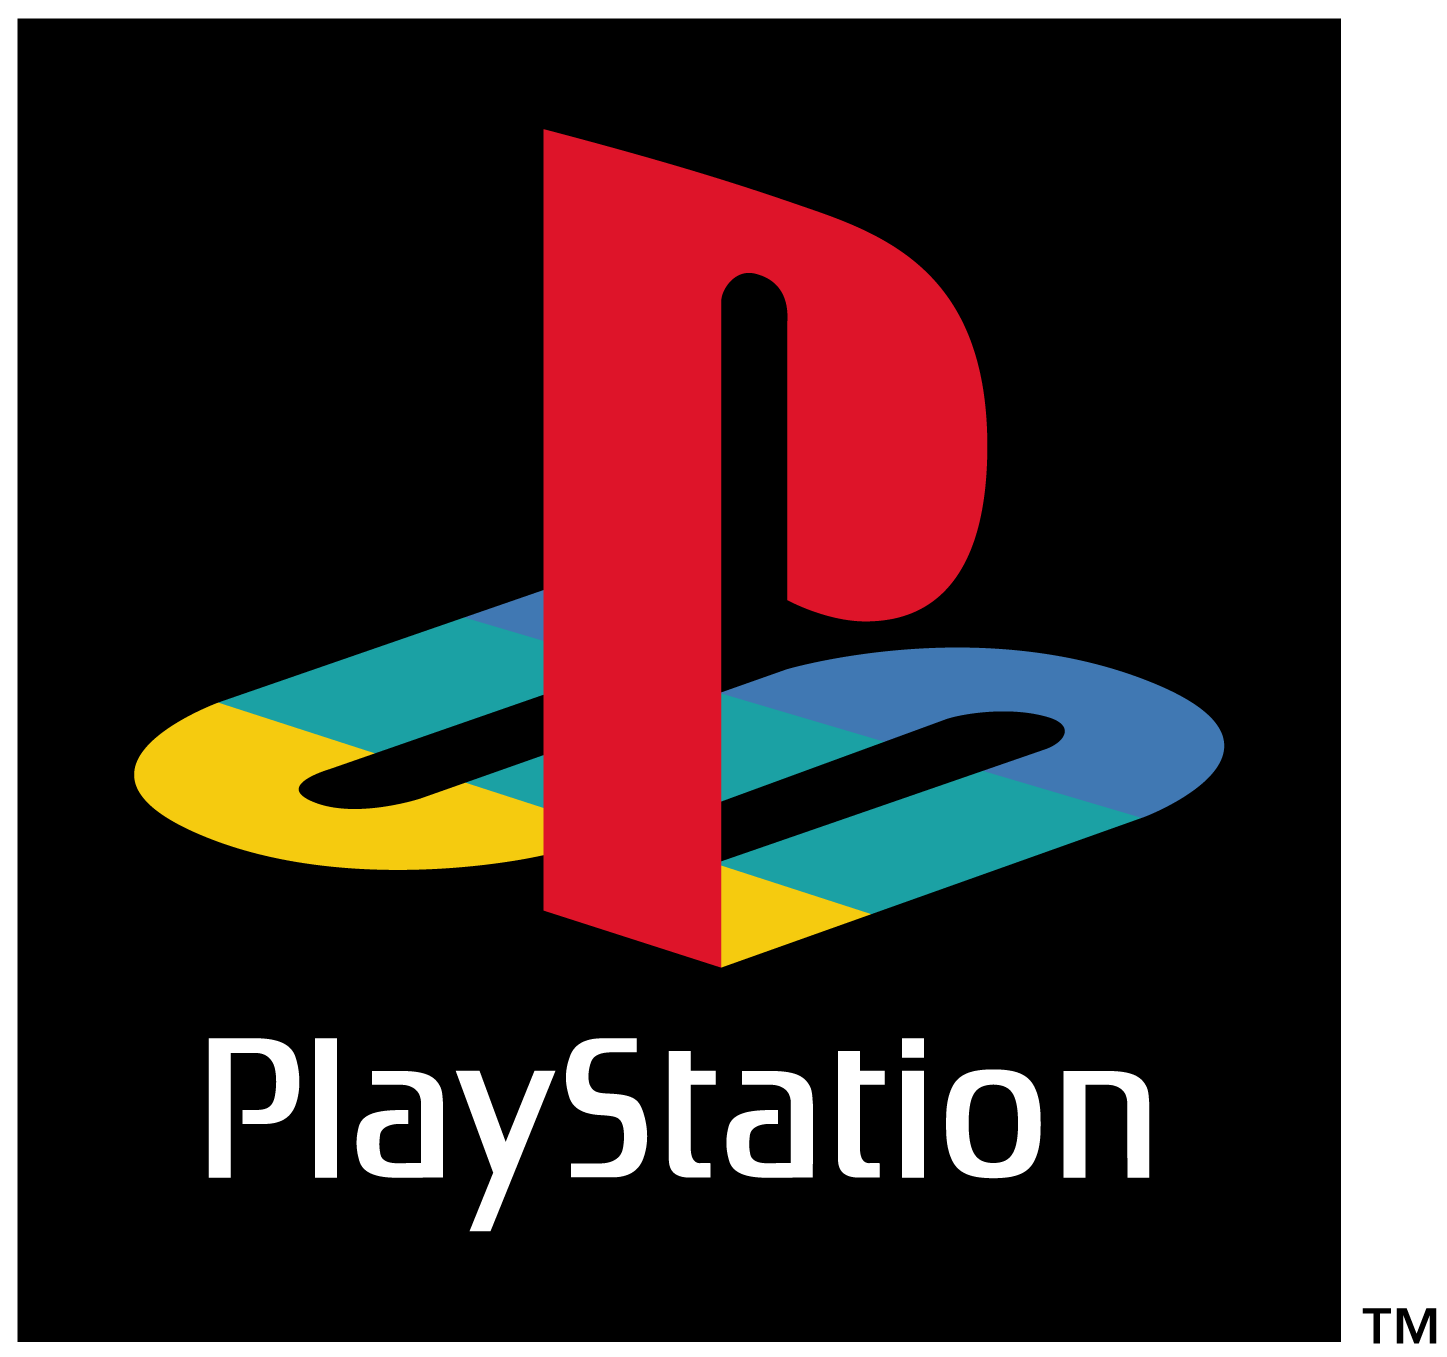 image logo psx png logopedia fandom powered by wikia rh logos wikia com playstation 1 logo png playstation 1 logo sticker